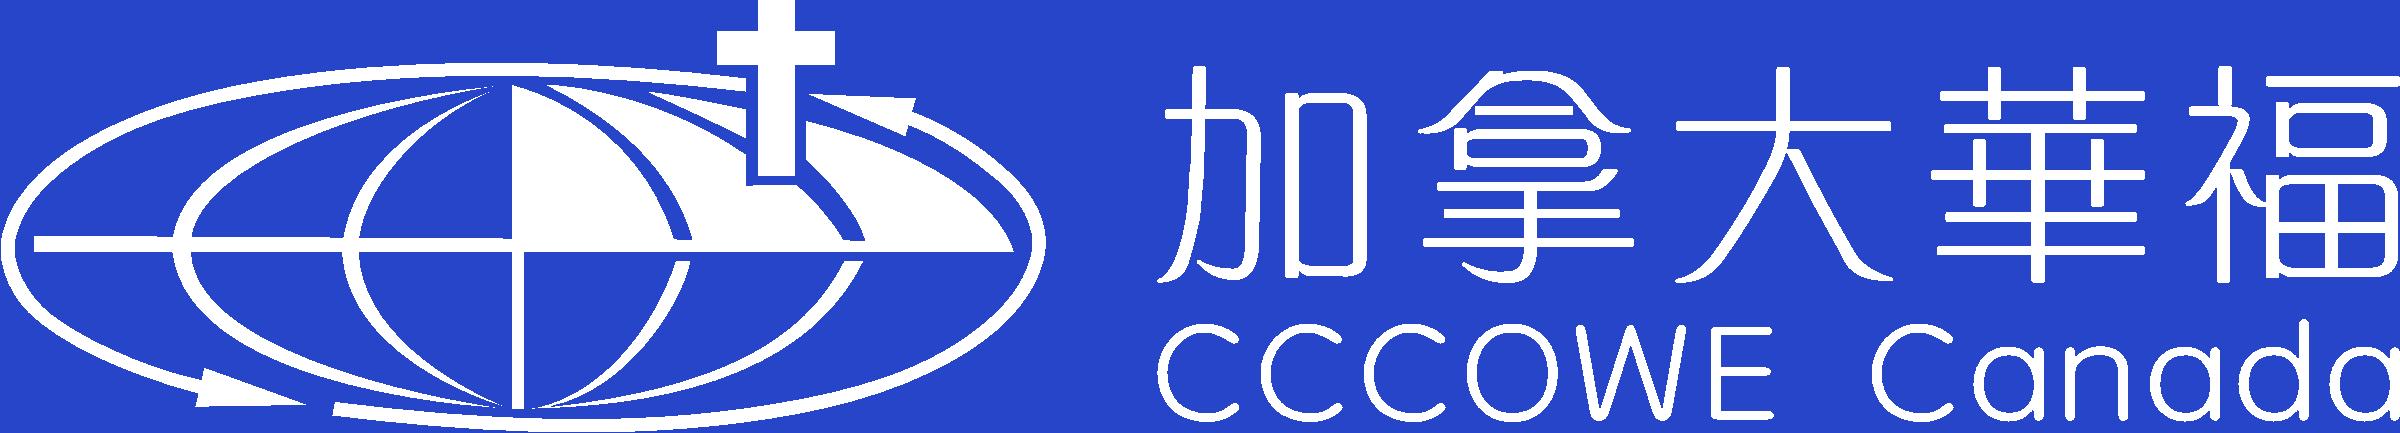 CCCOWE Canada